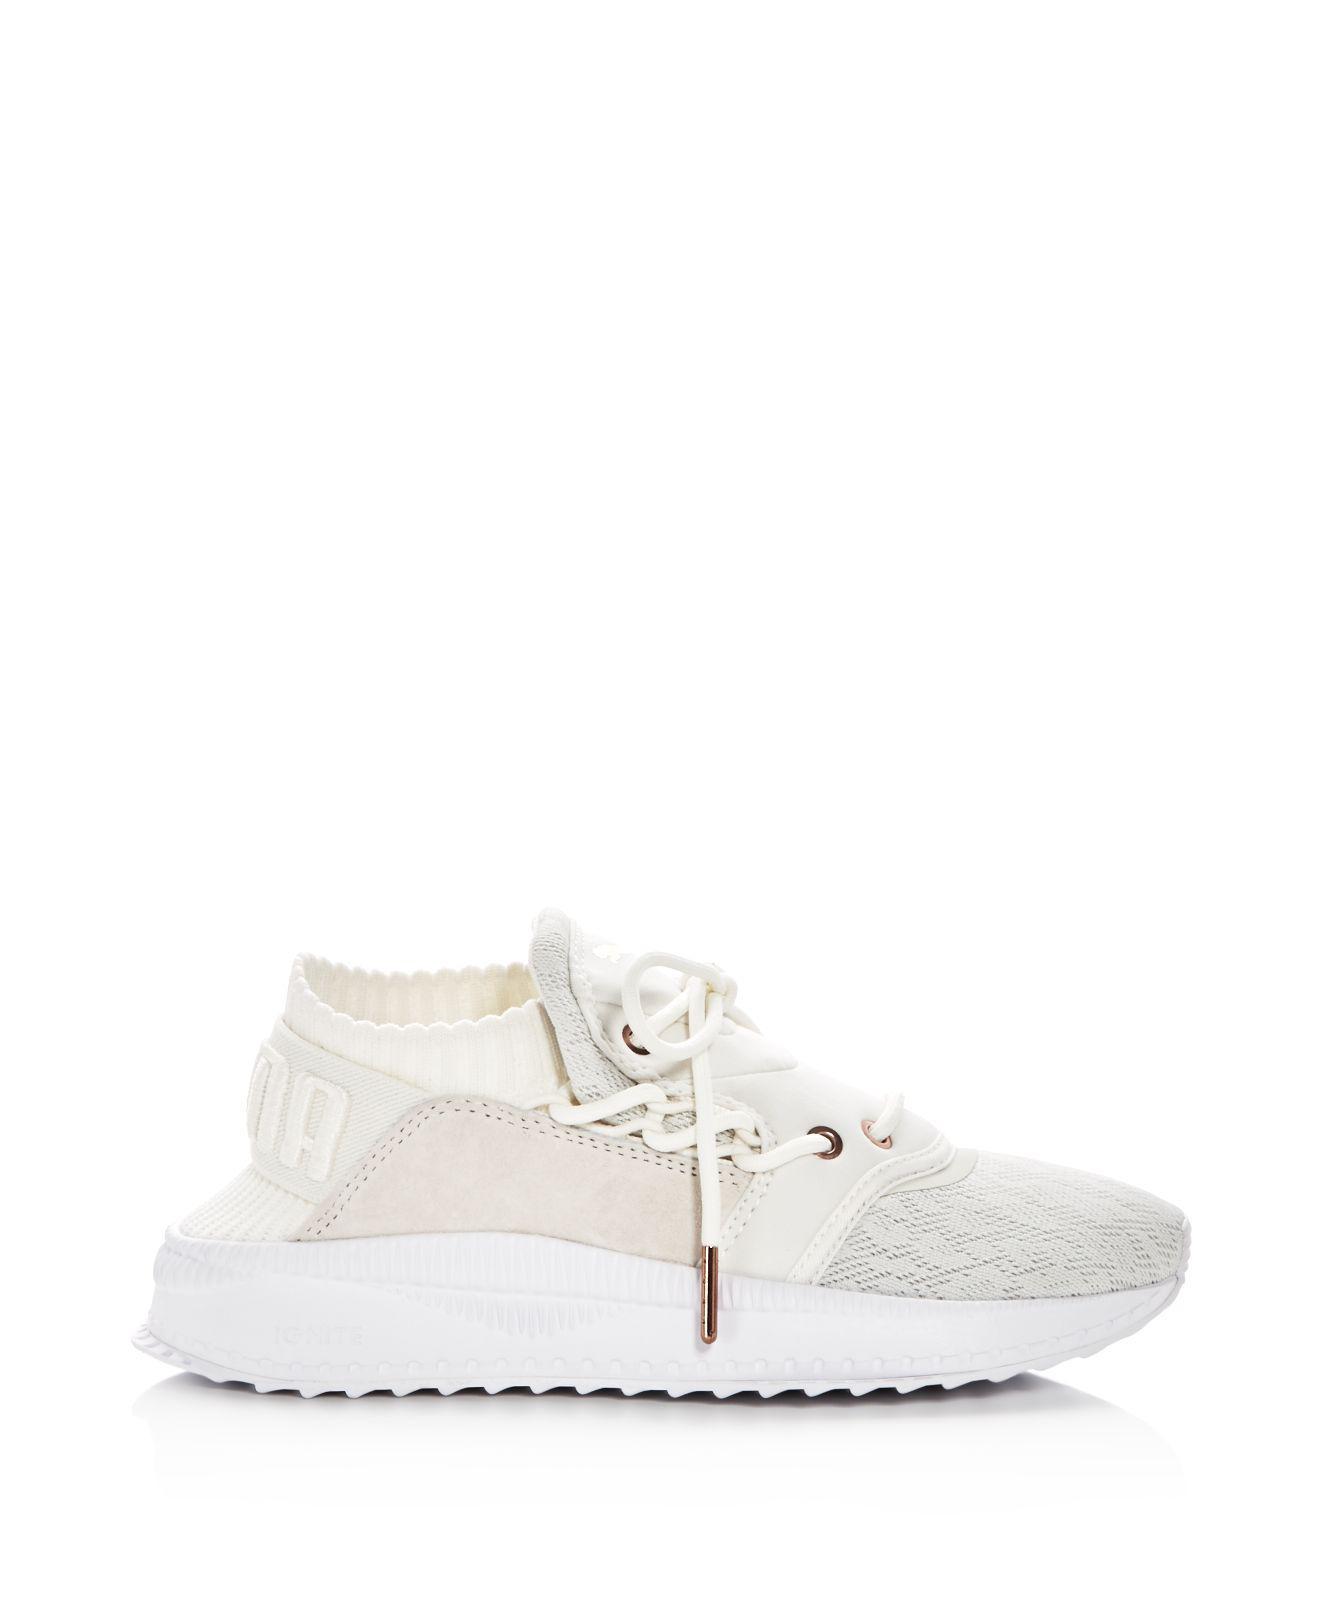 Lyst - PUMA Women s Tsugi Shinsei Lace Up Sneakers in White 15e3b86de